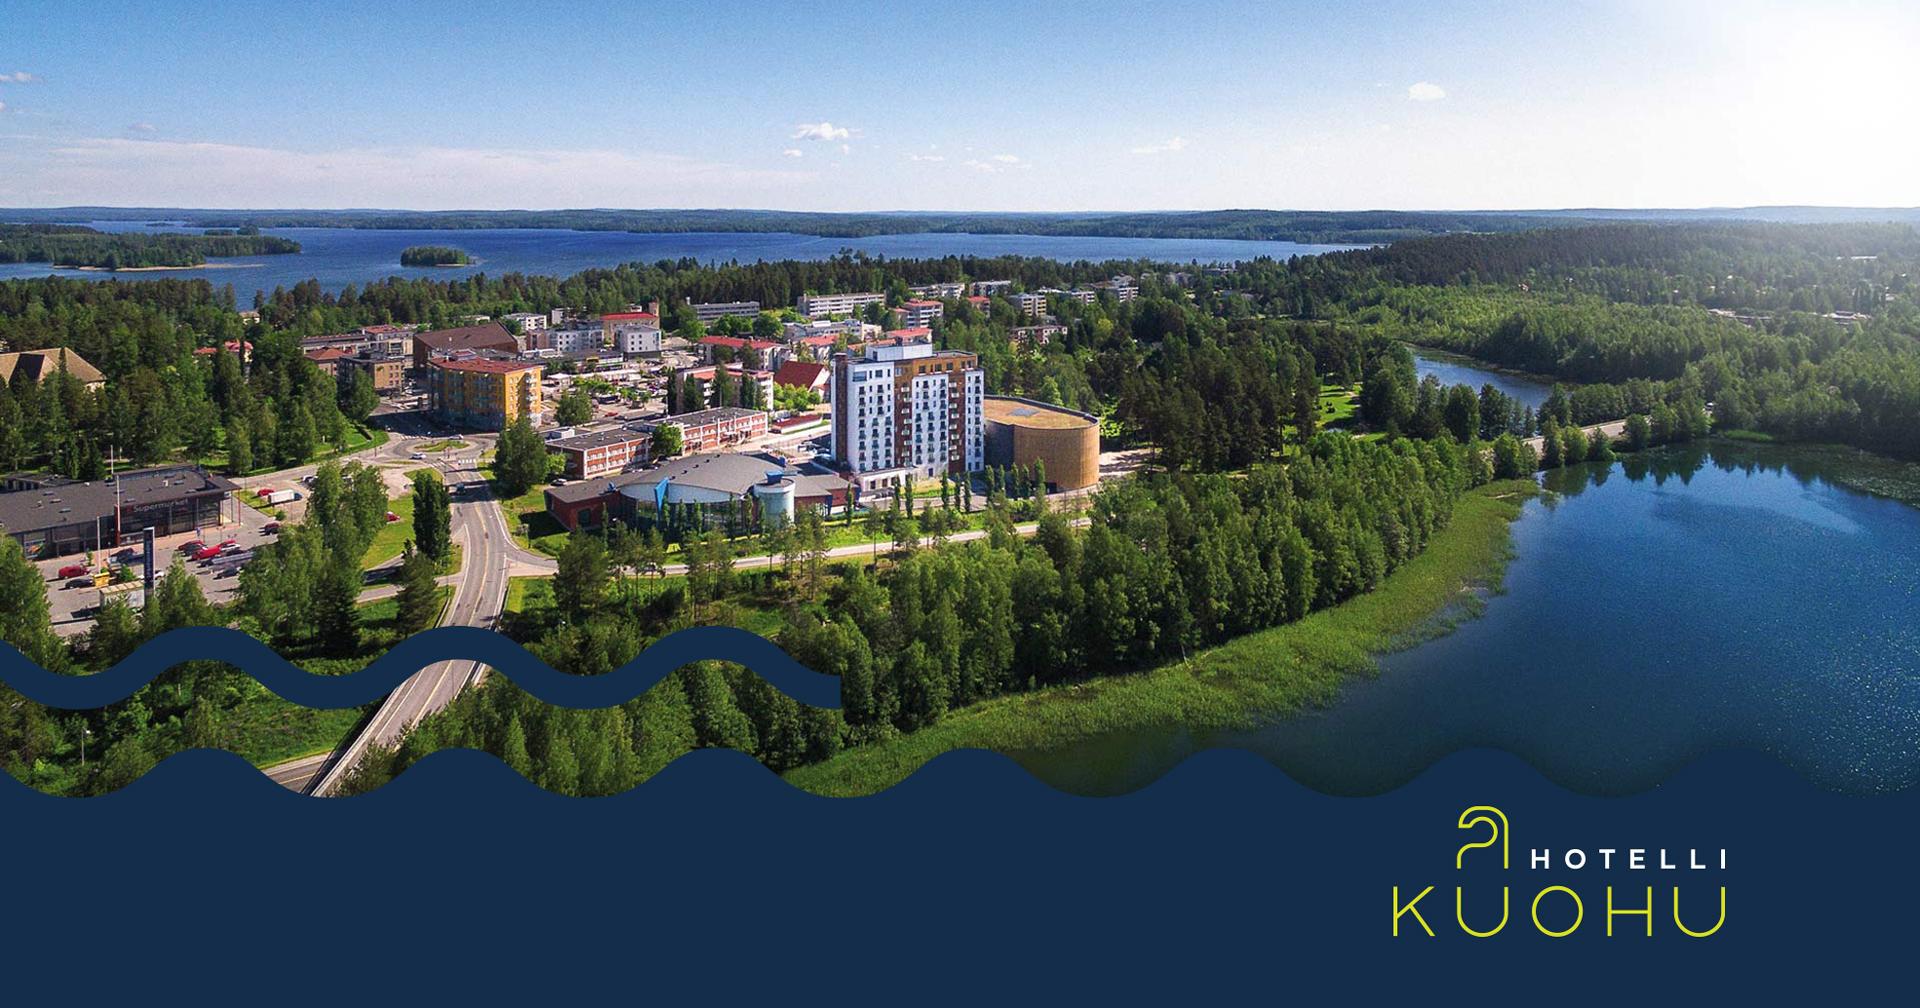 Kangasala Hotelli